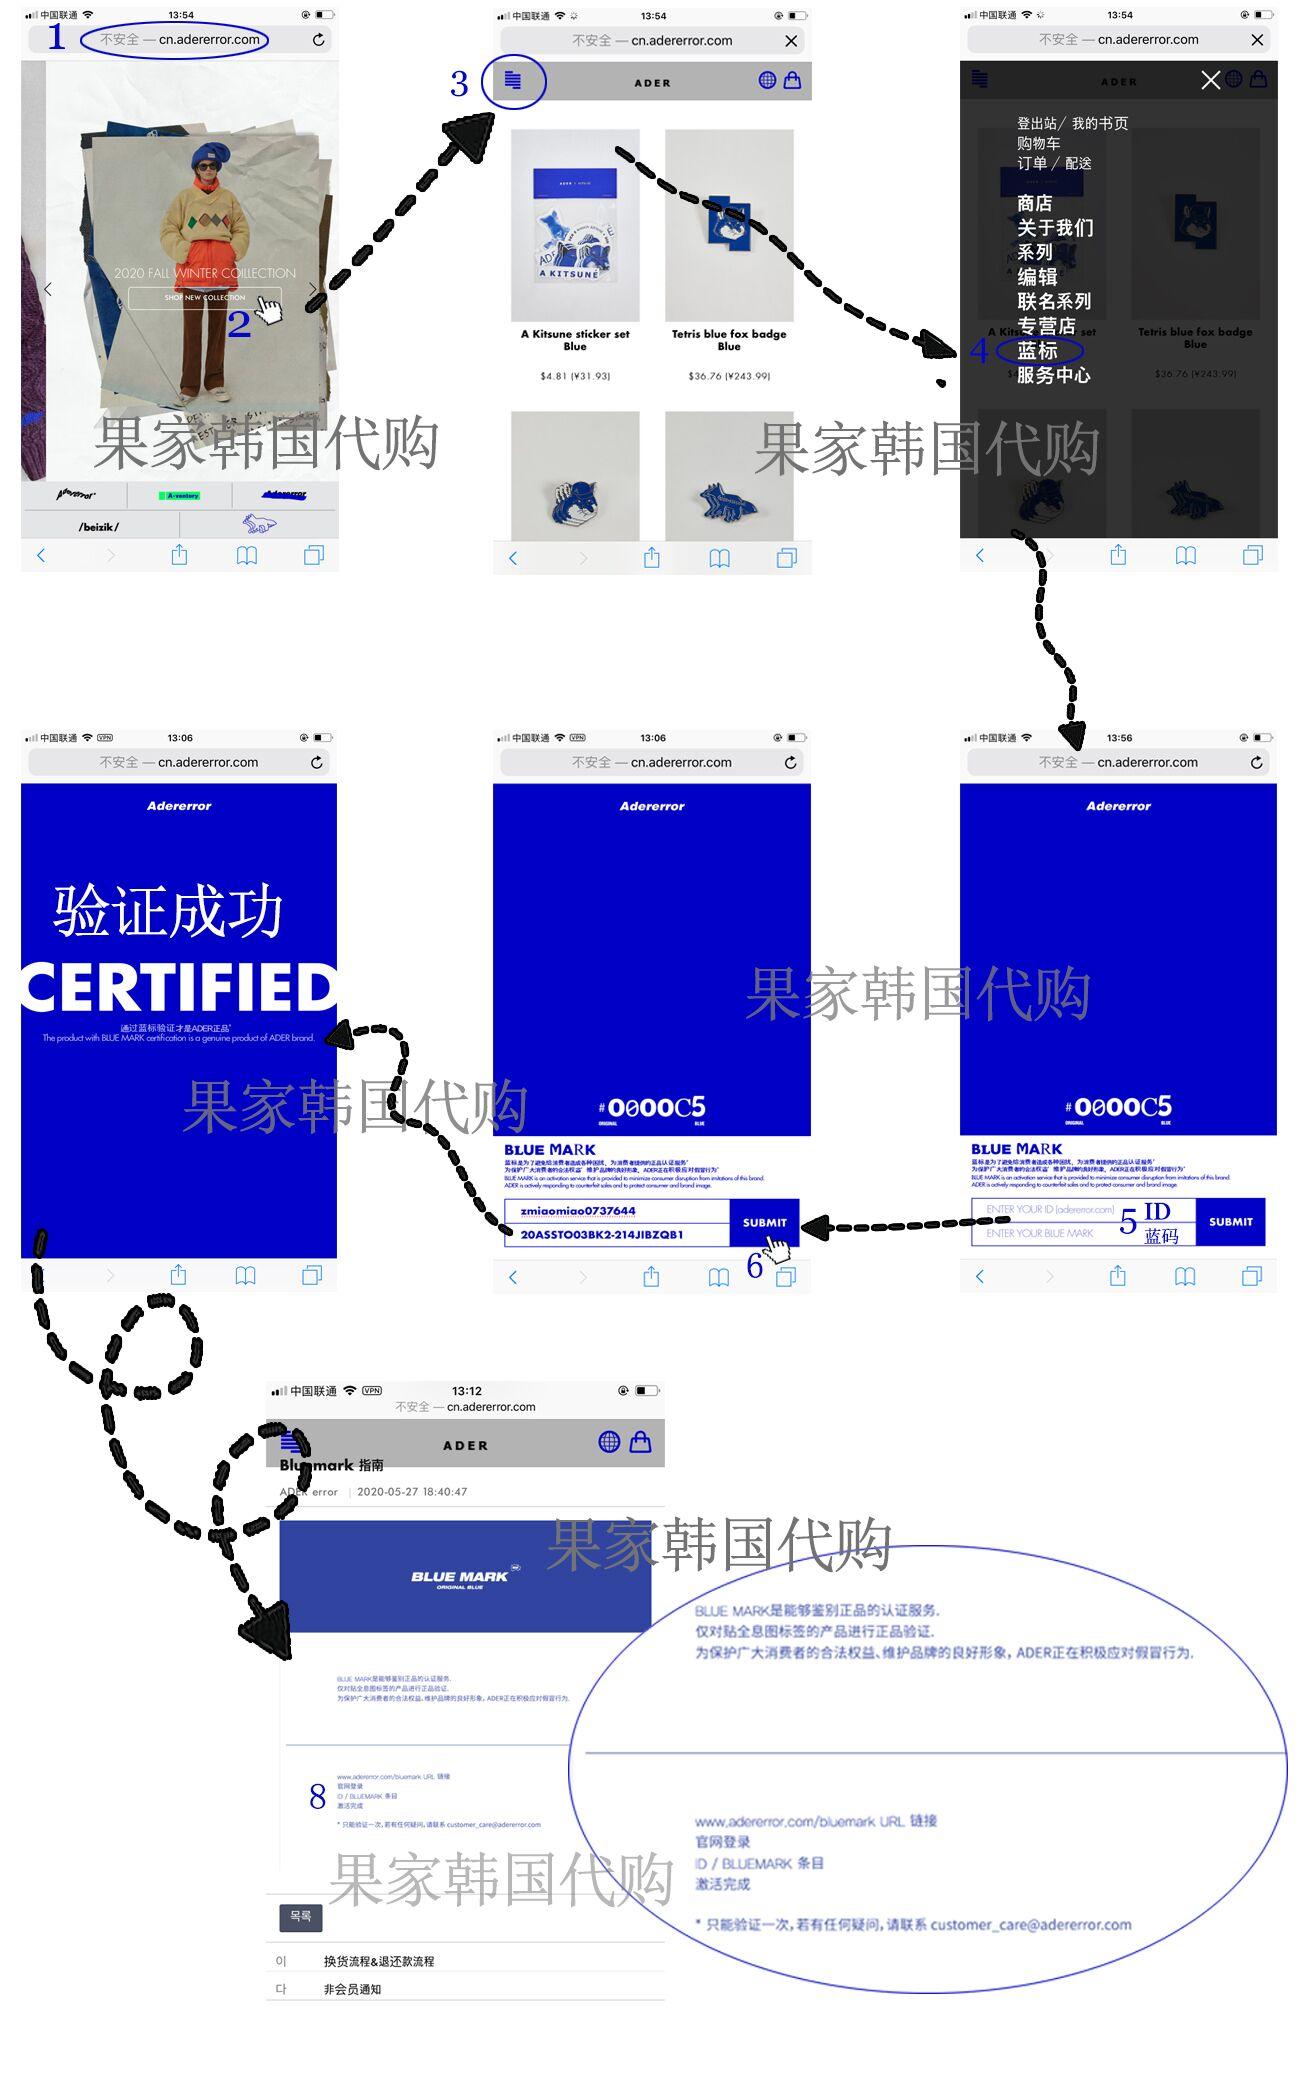 韓國代購專賣~藍碼可驗2021春夏新品「ADER ERROR」Jumbled sweatshirt褶皺衛衣